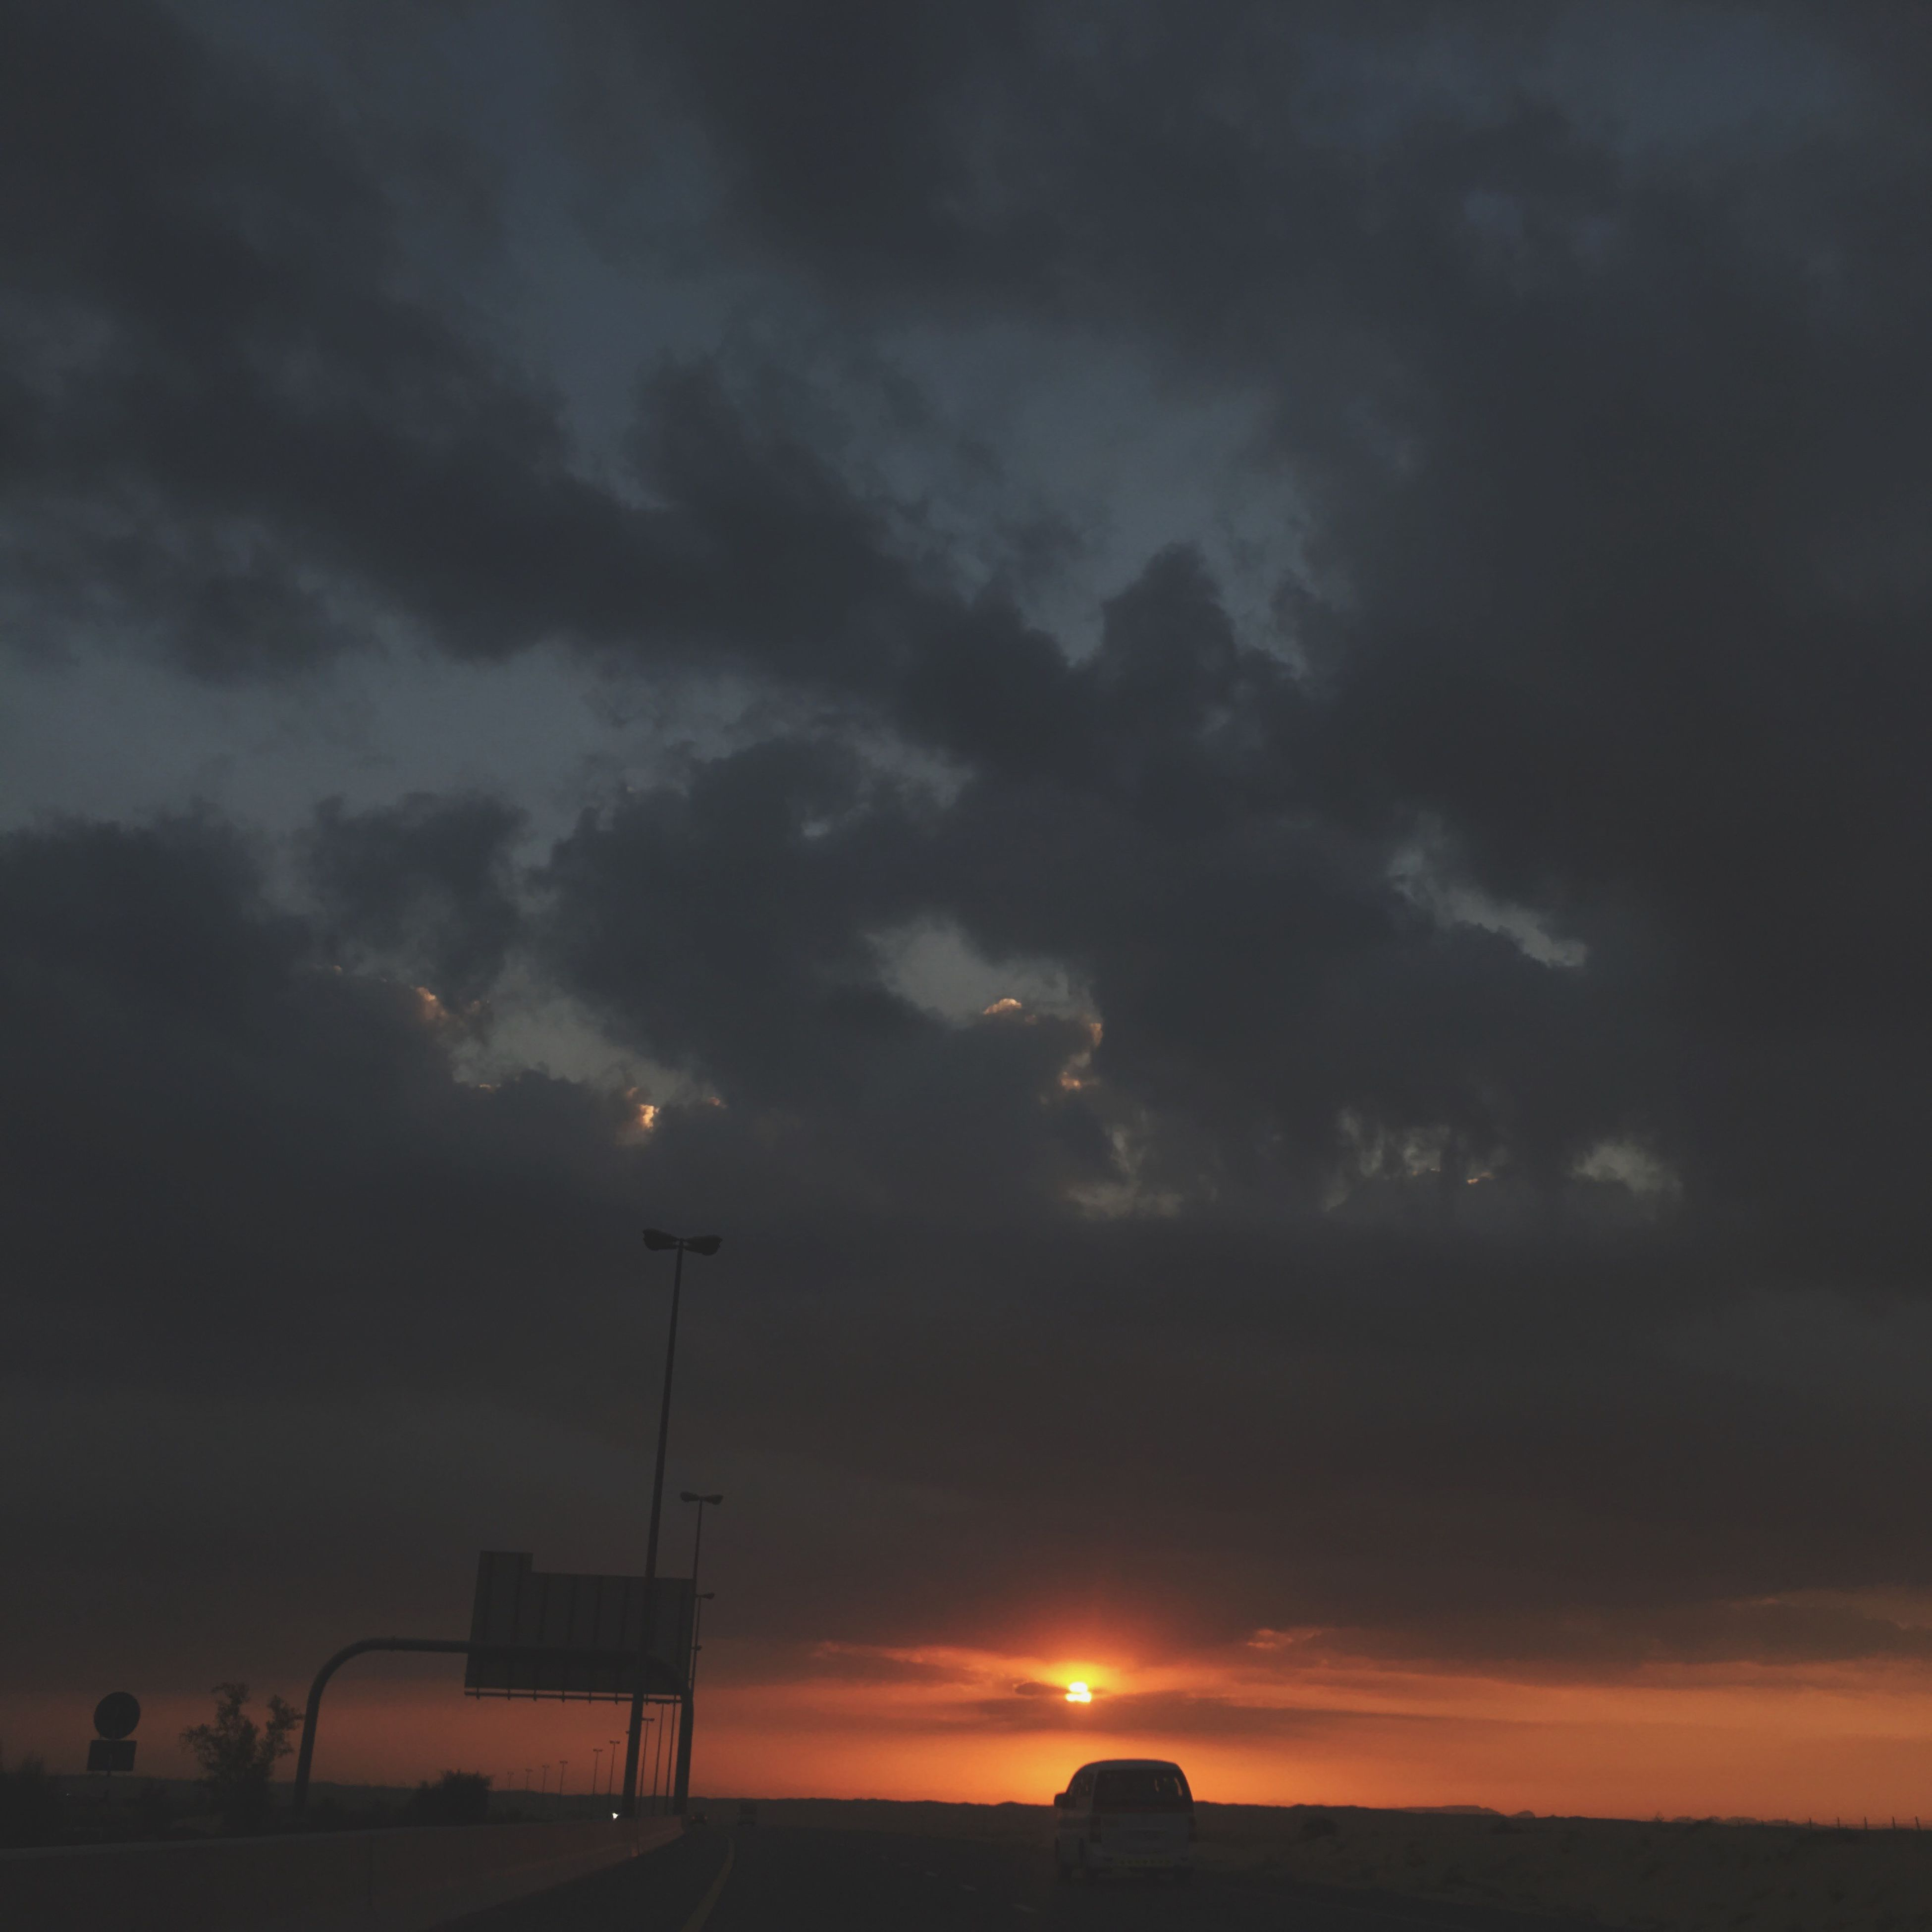 sunset, sky, cloud - sky, silhouette, scenics, beauty in nature, tranquil scene, tranquility, cloudy, orange color, nature, dramatic sky, landscape, street light, cloud, idyllic, weather, transportation, sun, outdoors